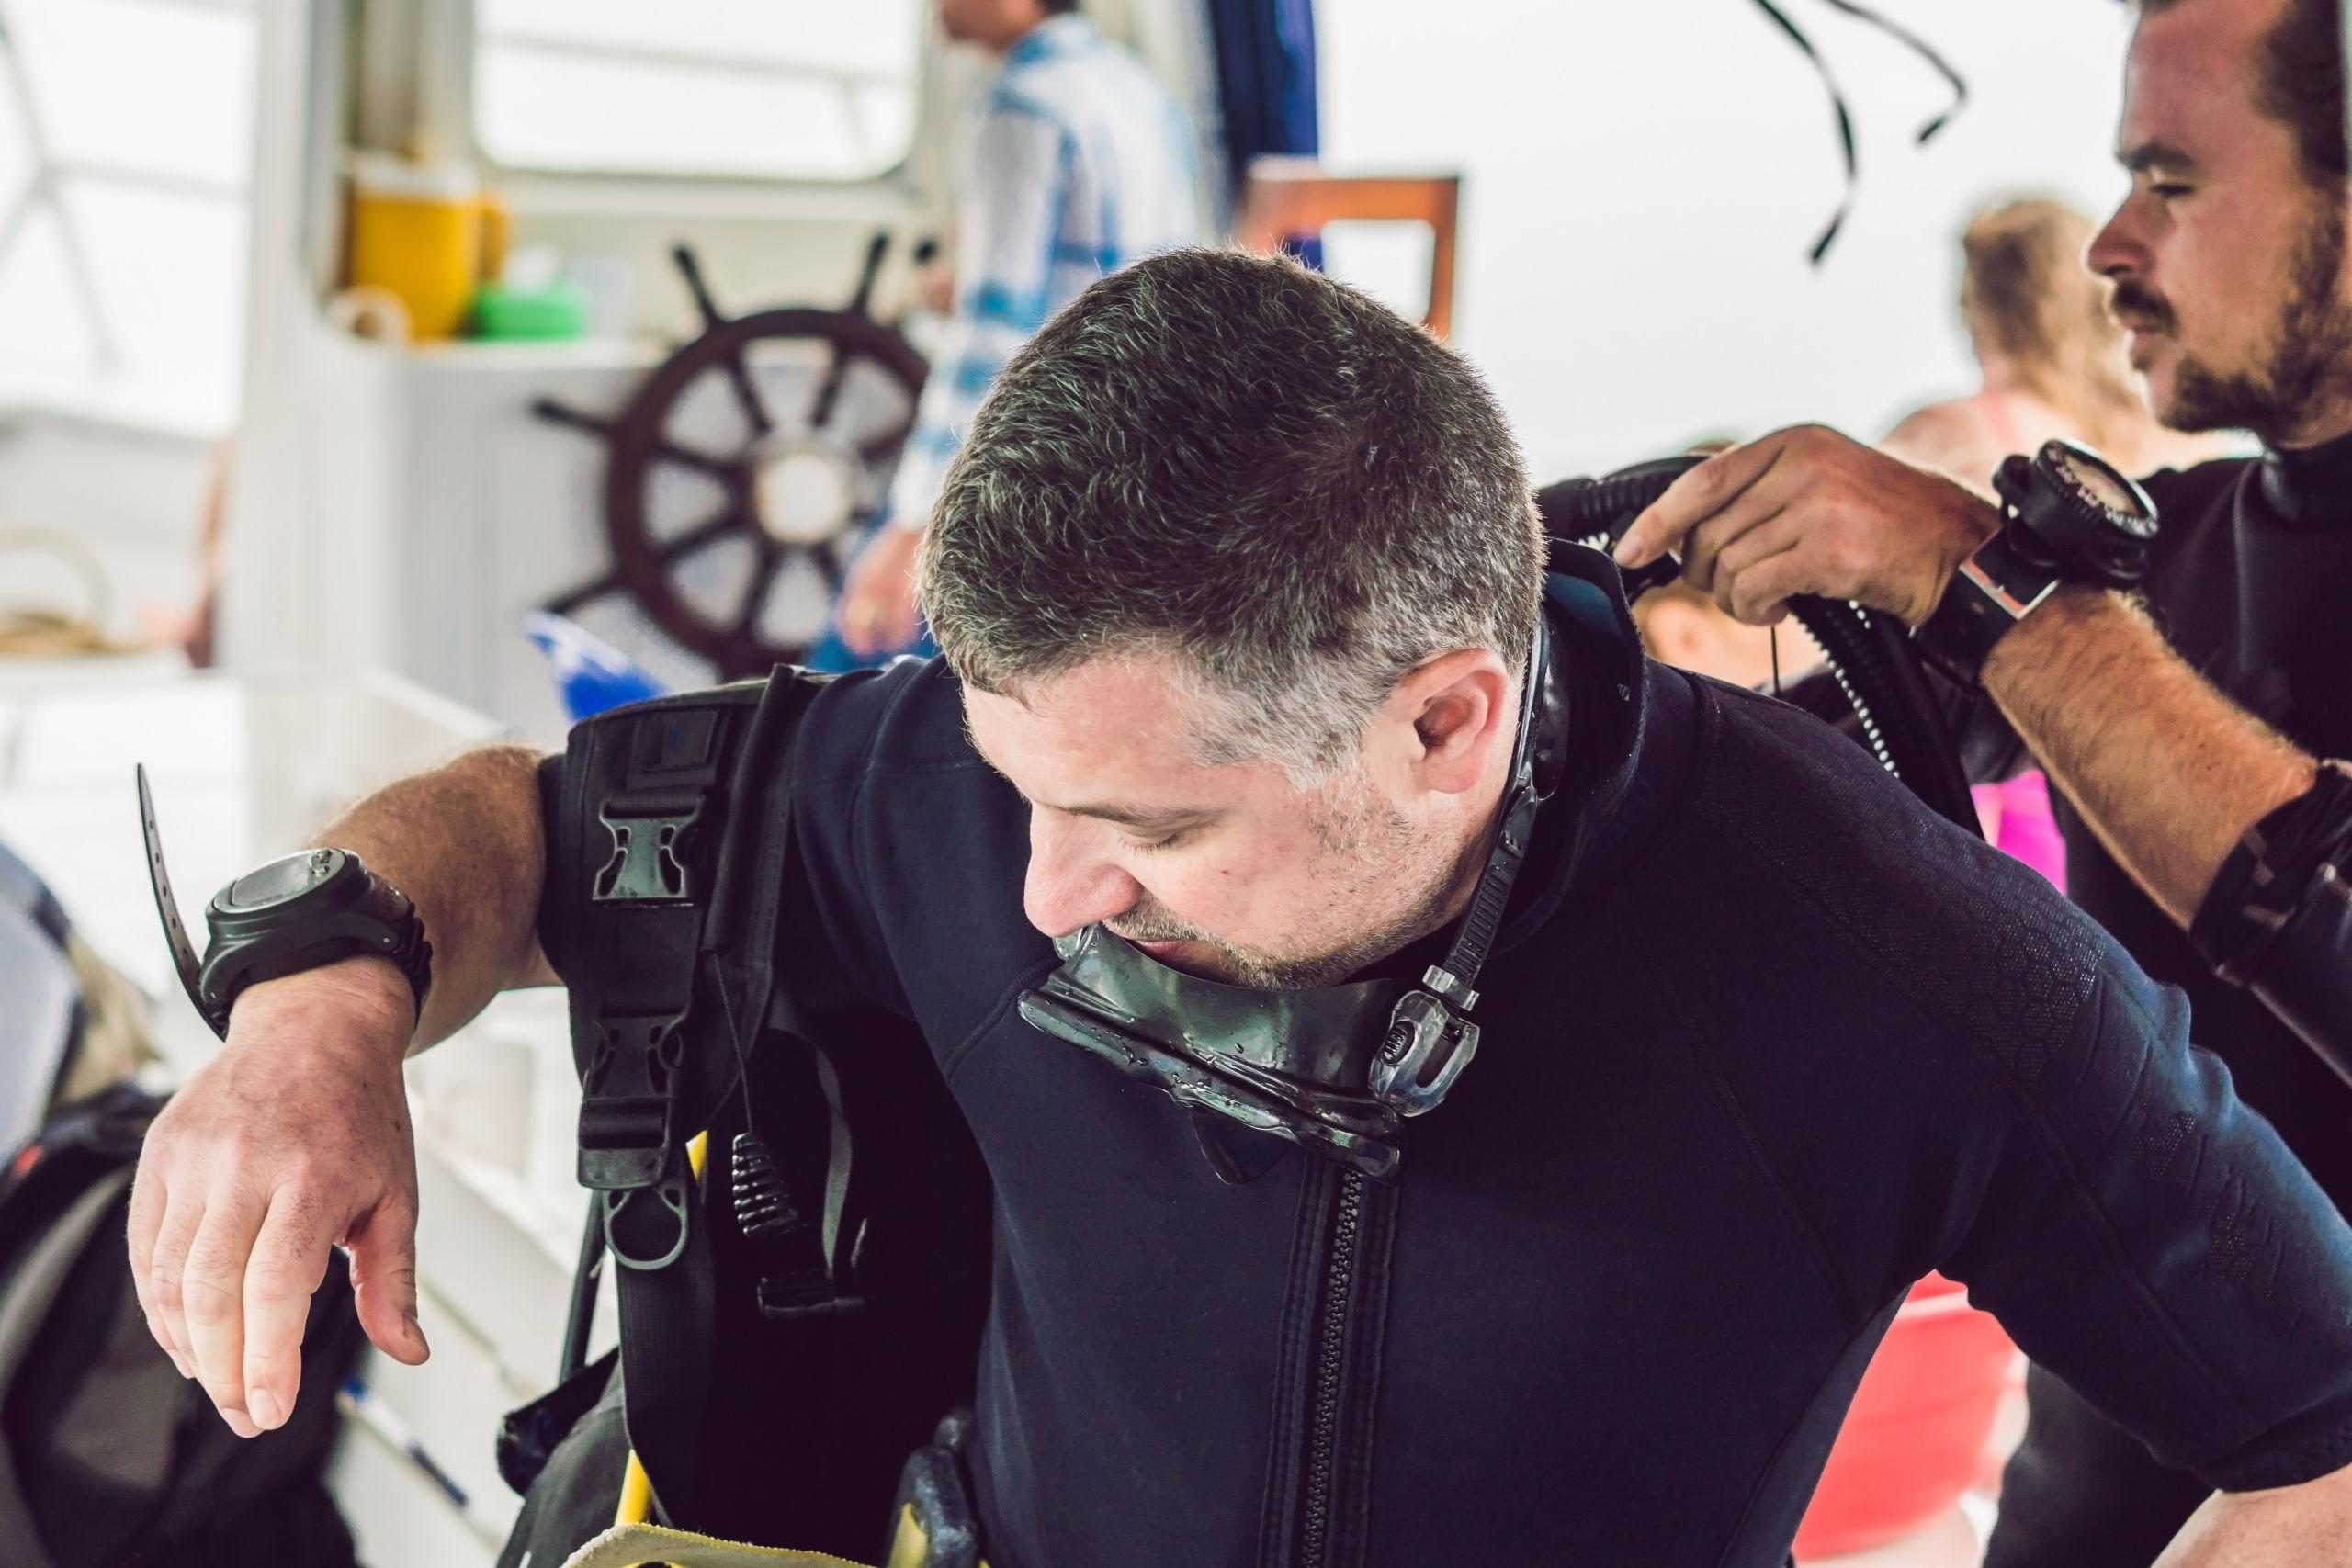 https://www.scubadivermag.com.au/dan-world-preventing-panic-while-diving/